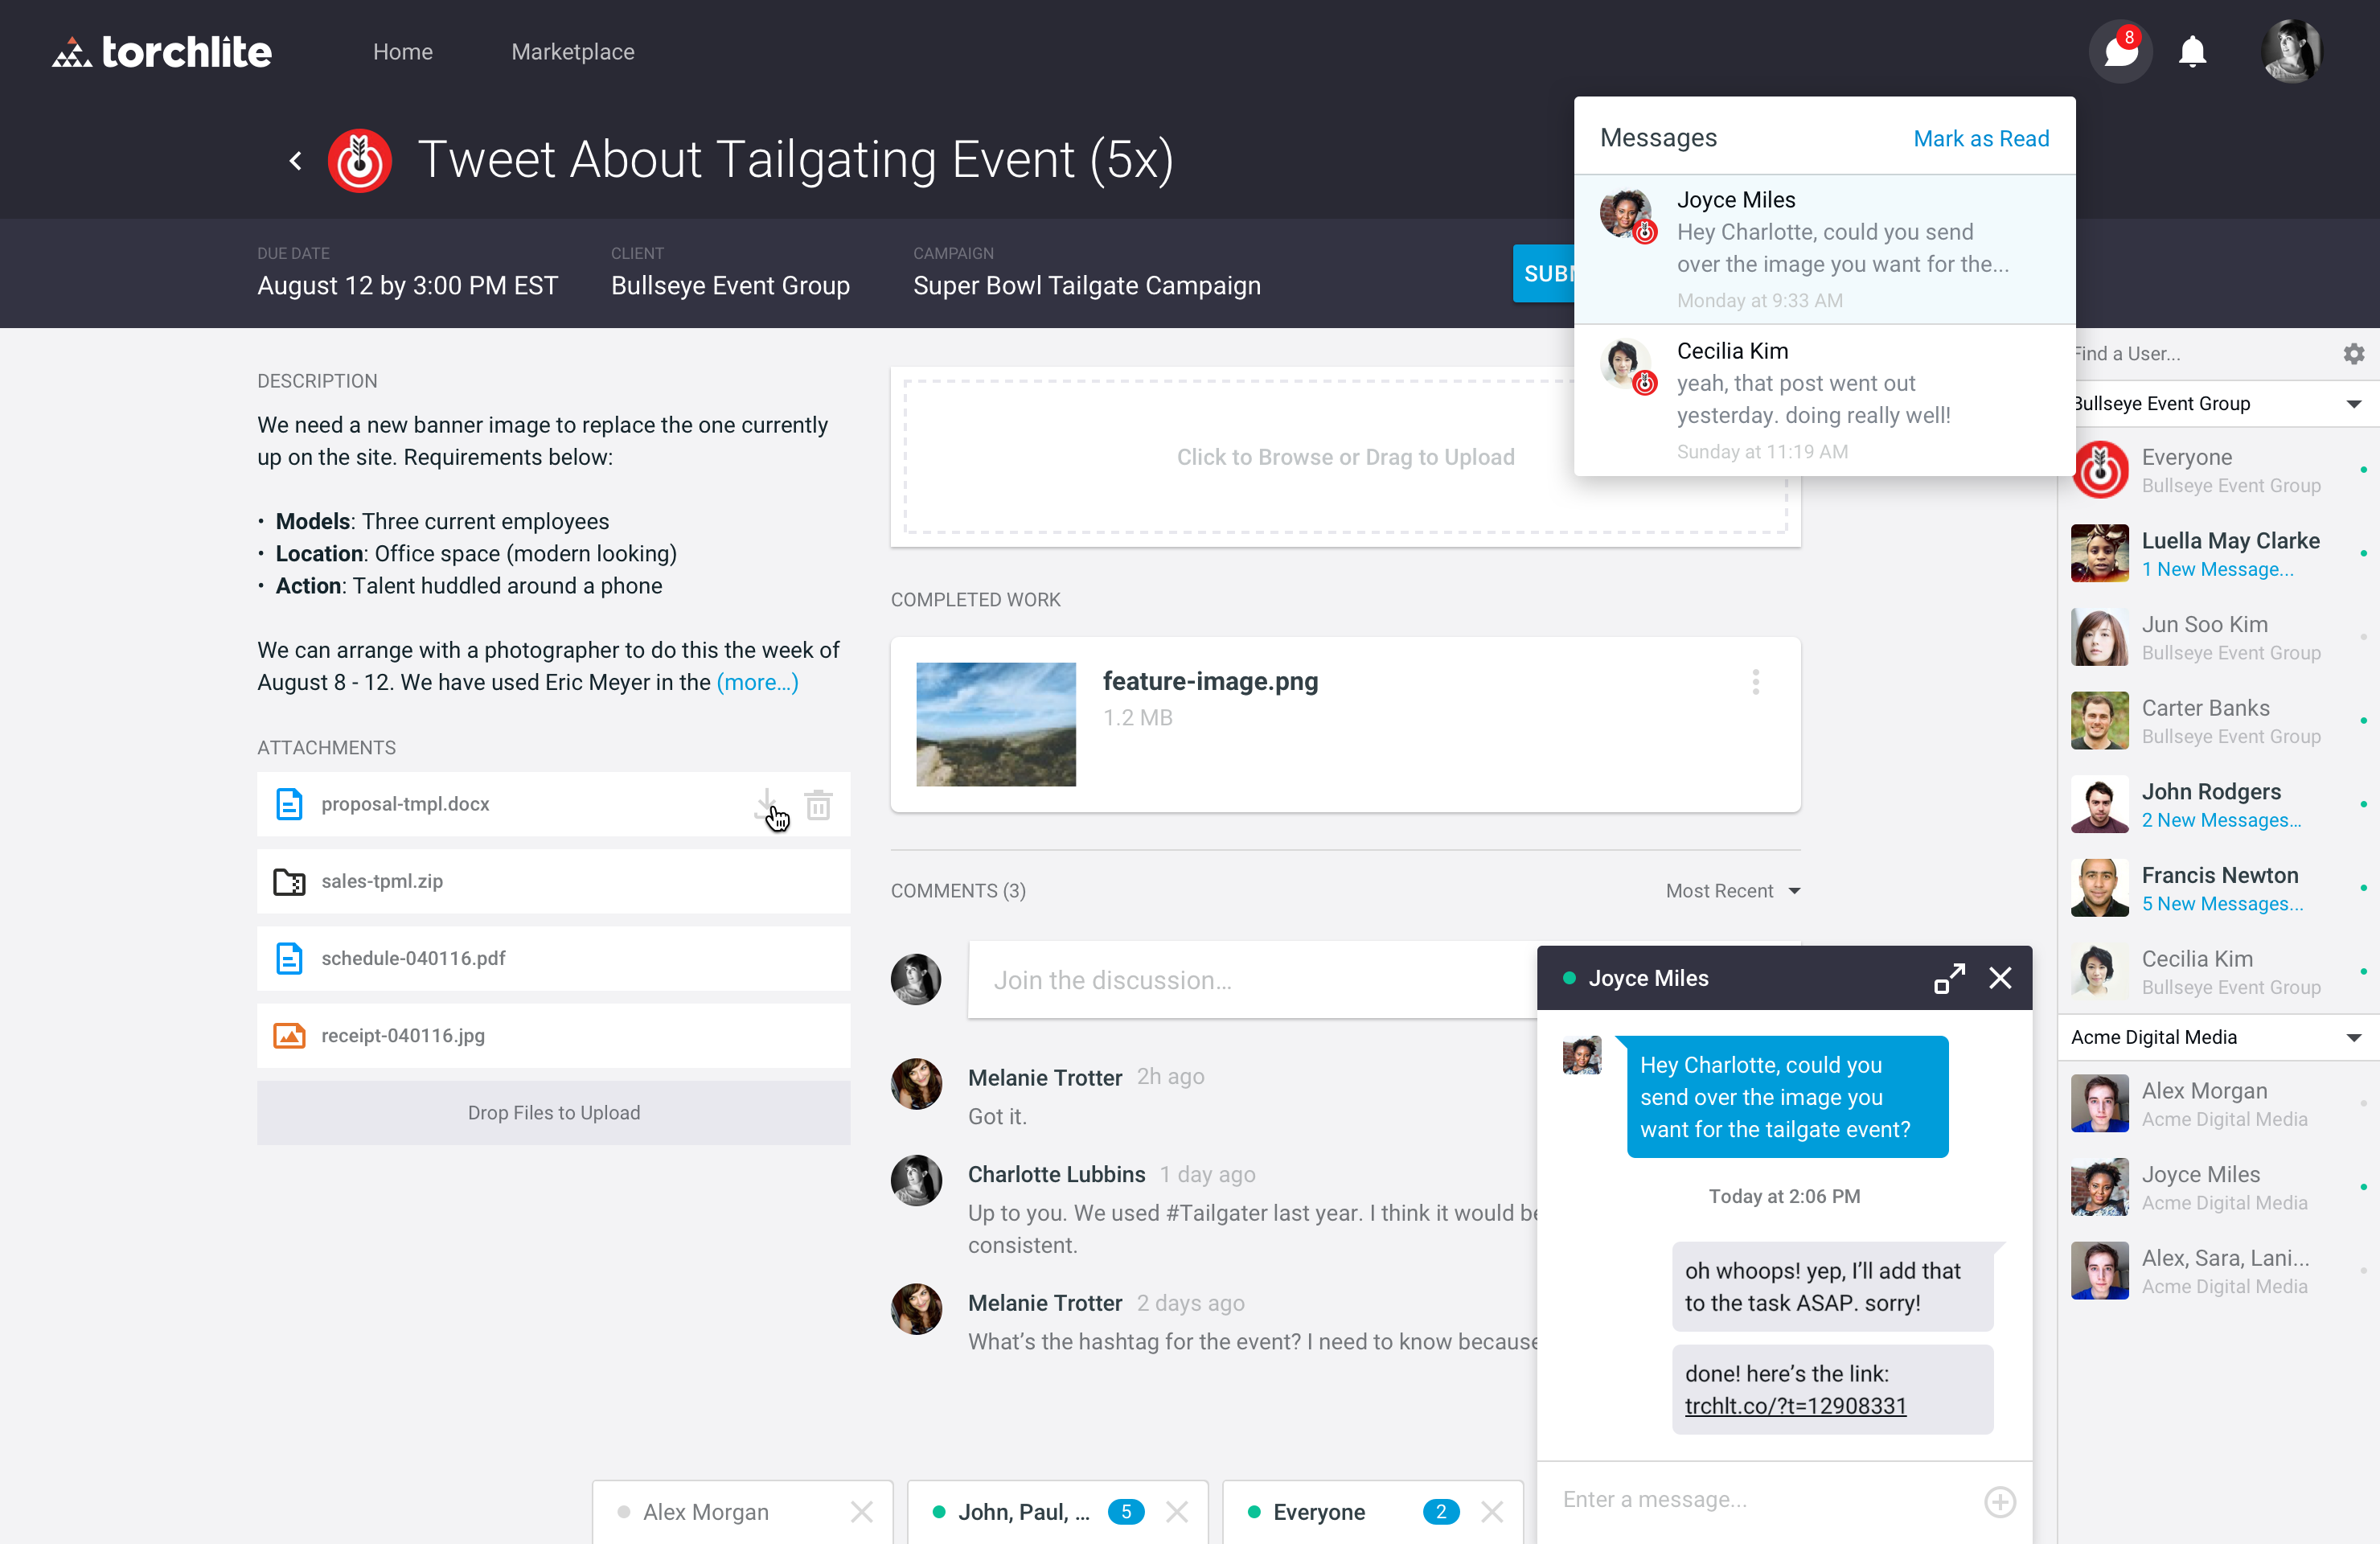 Chat in Torchlite platform